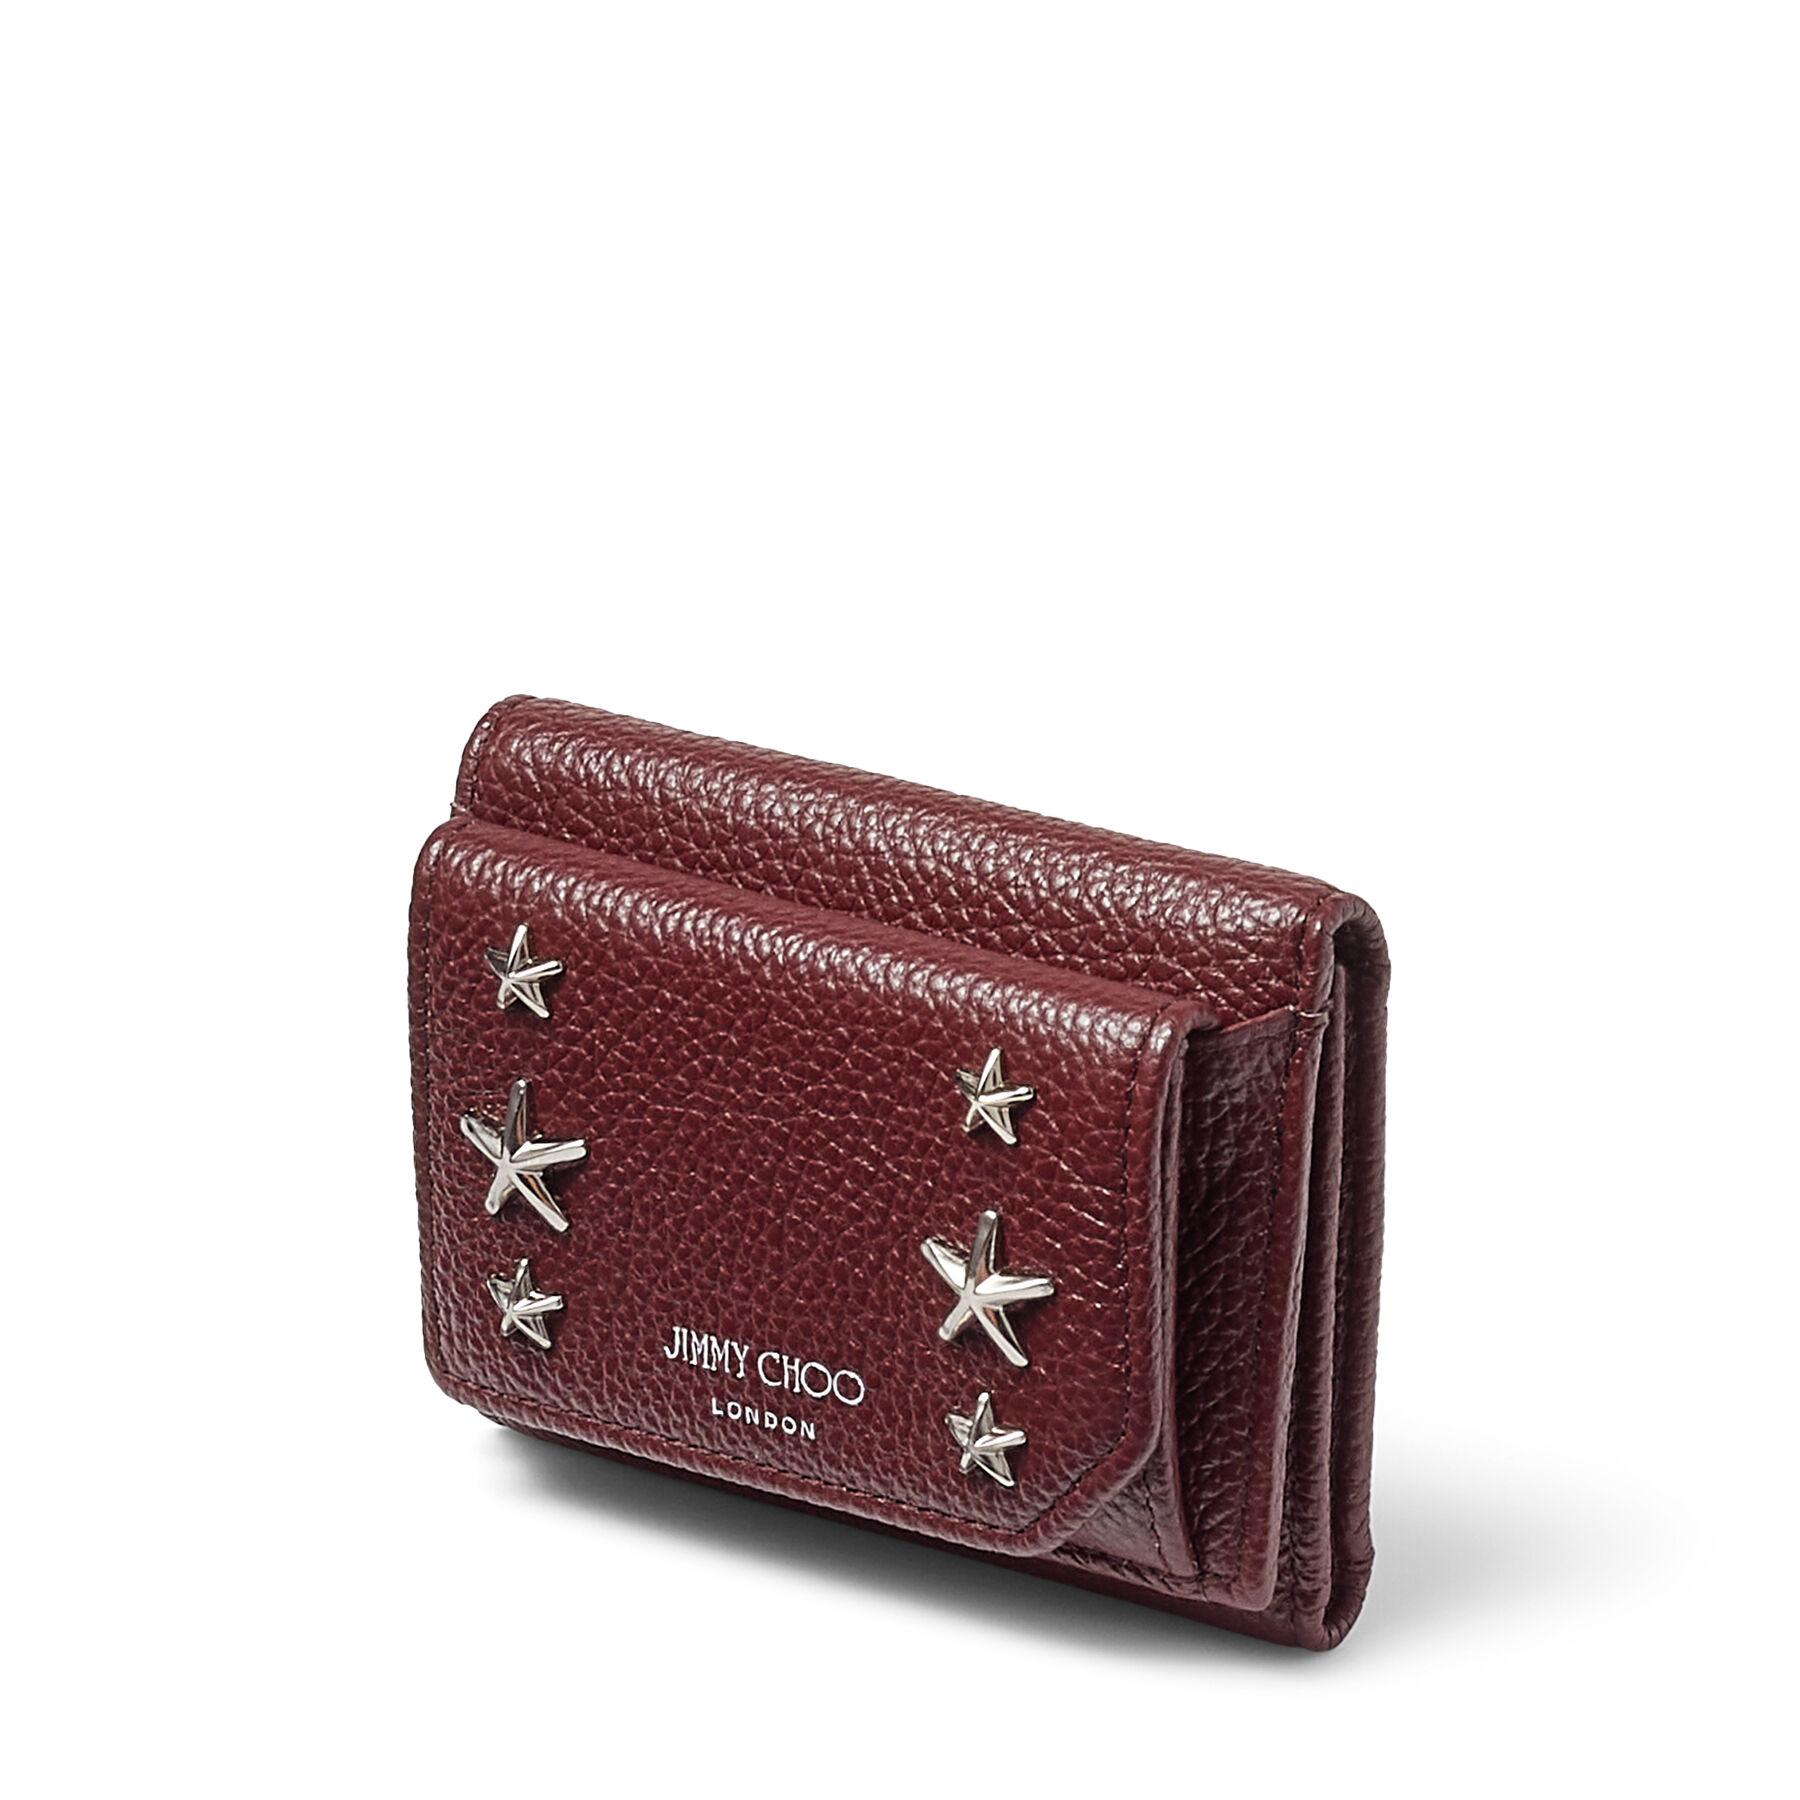 JIMMY CHOO ミニ財布 の外装画像